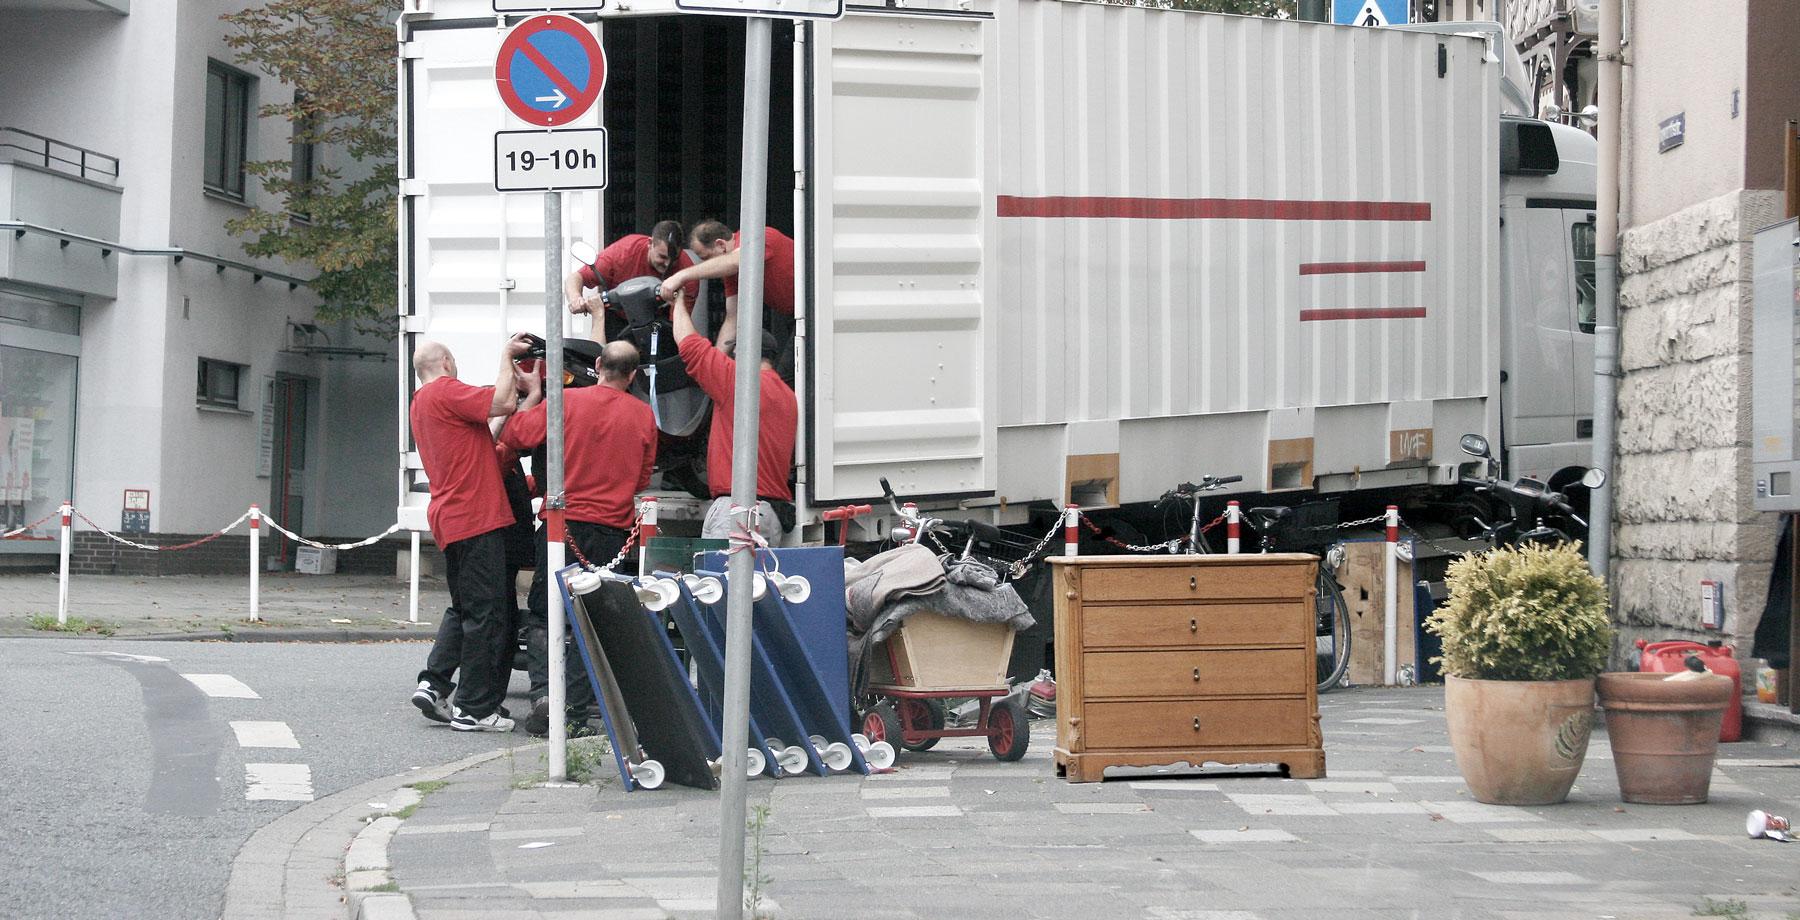 I.C.R. GmbH Hamburg, International Claims Recovery, Leistungen – Umzug